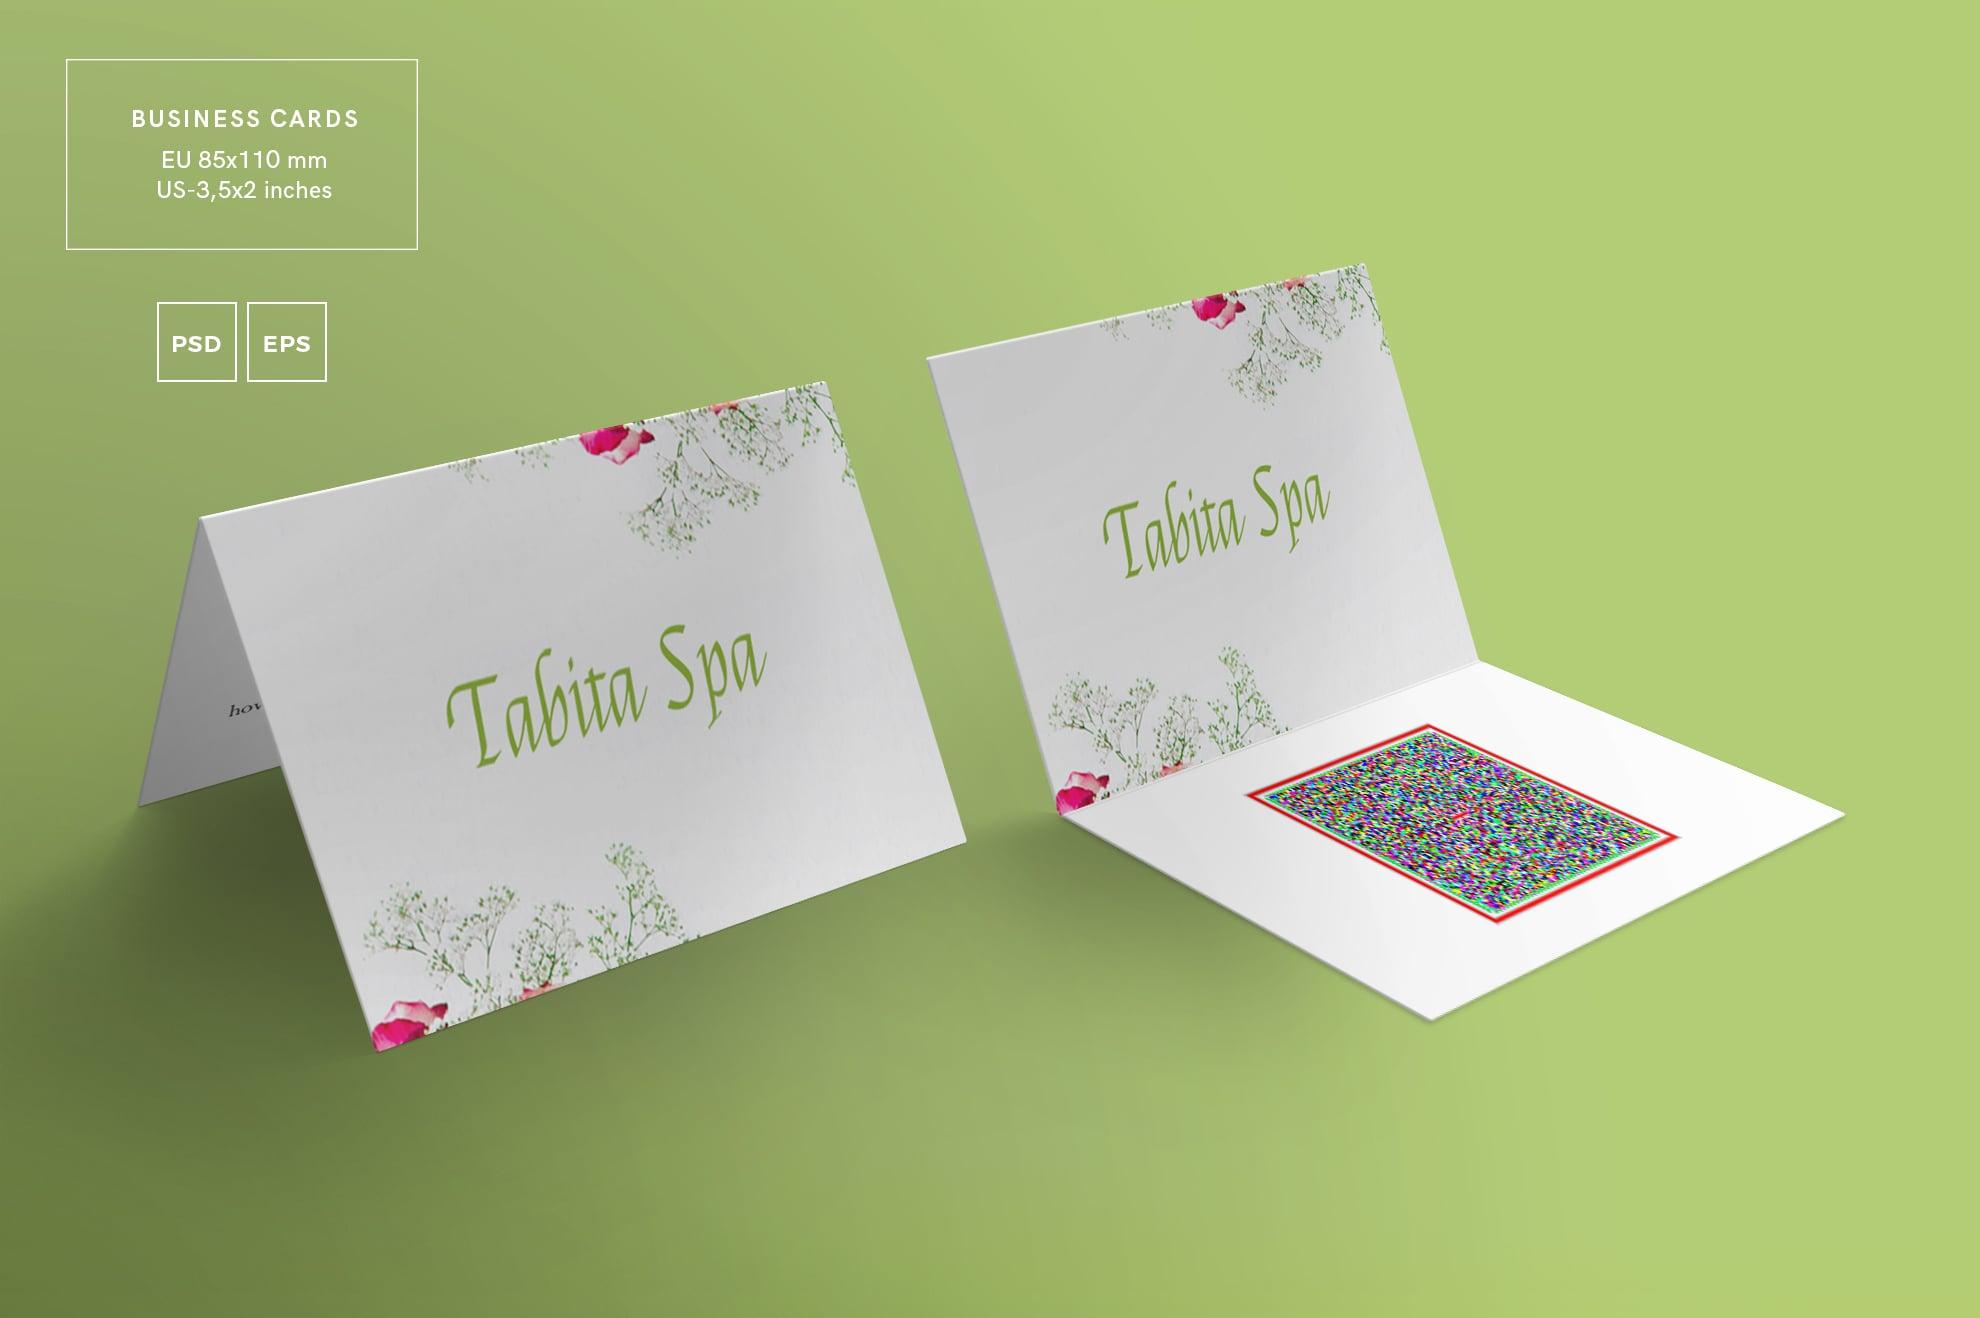 110 in 1 Business Card Bundle - 003 bc tabita spa 29 2